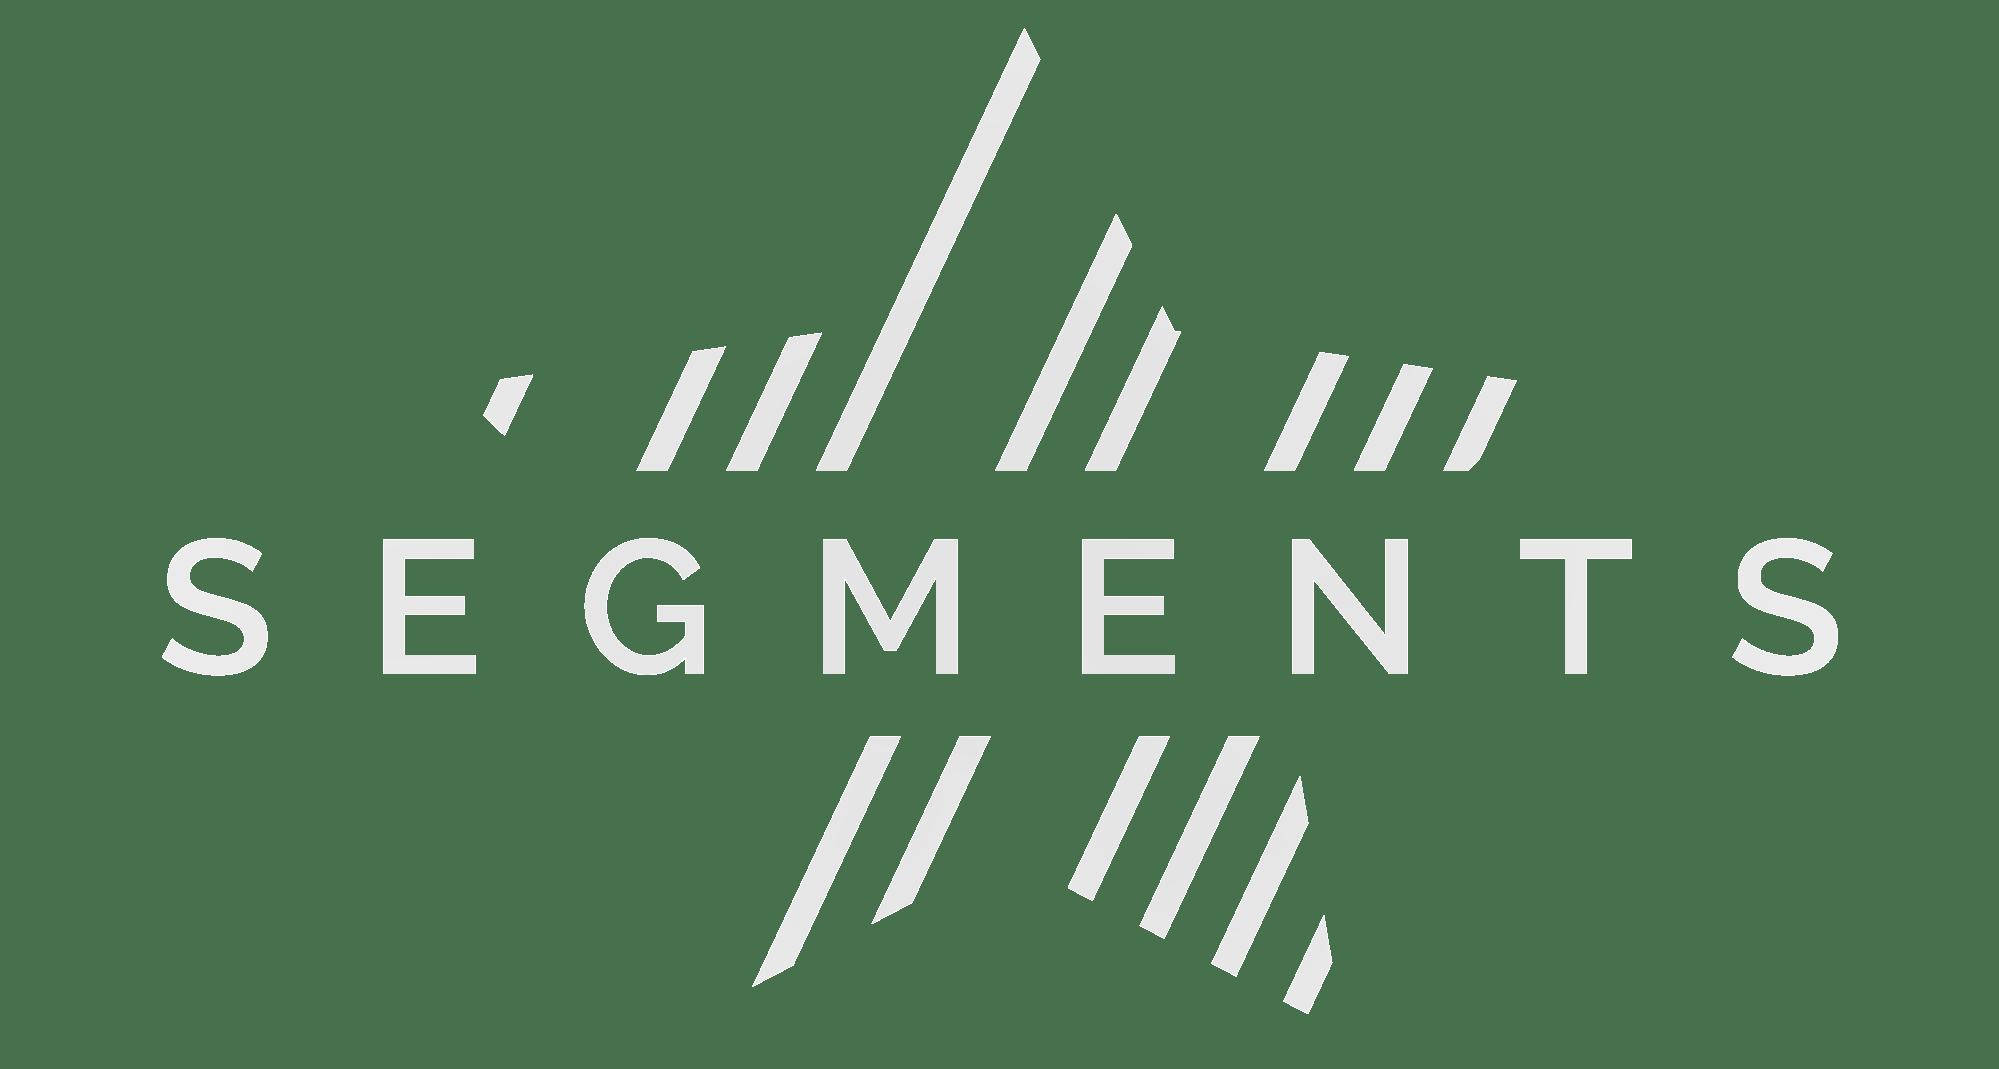 E-SEGMENTS